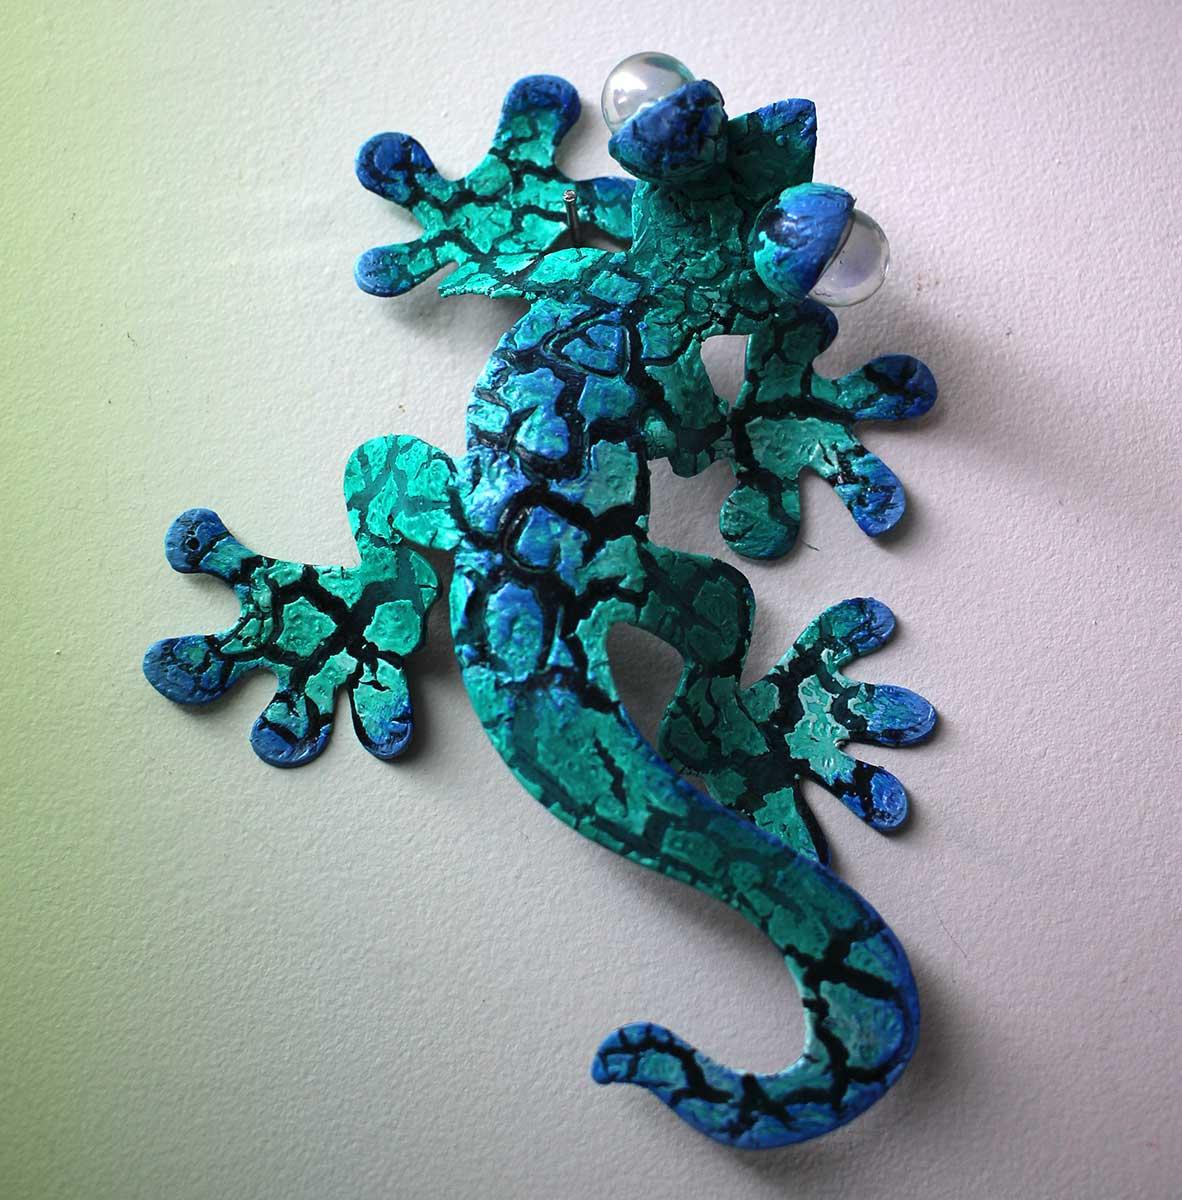 petite-salamandre-deco-murale-amadera